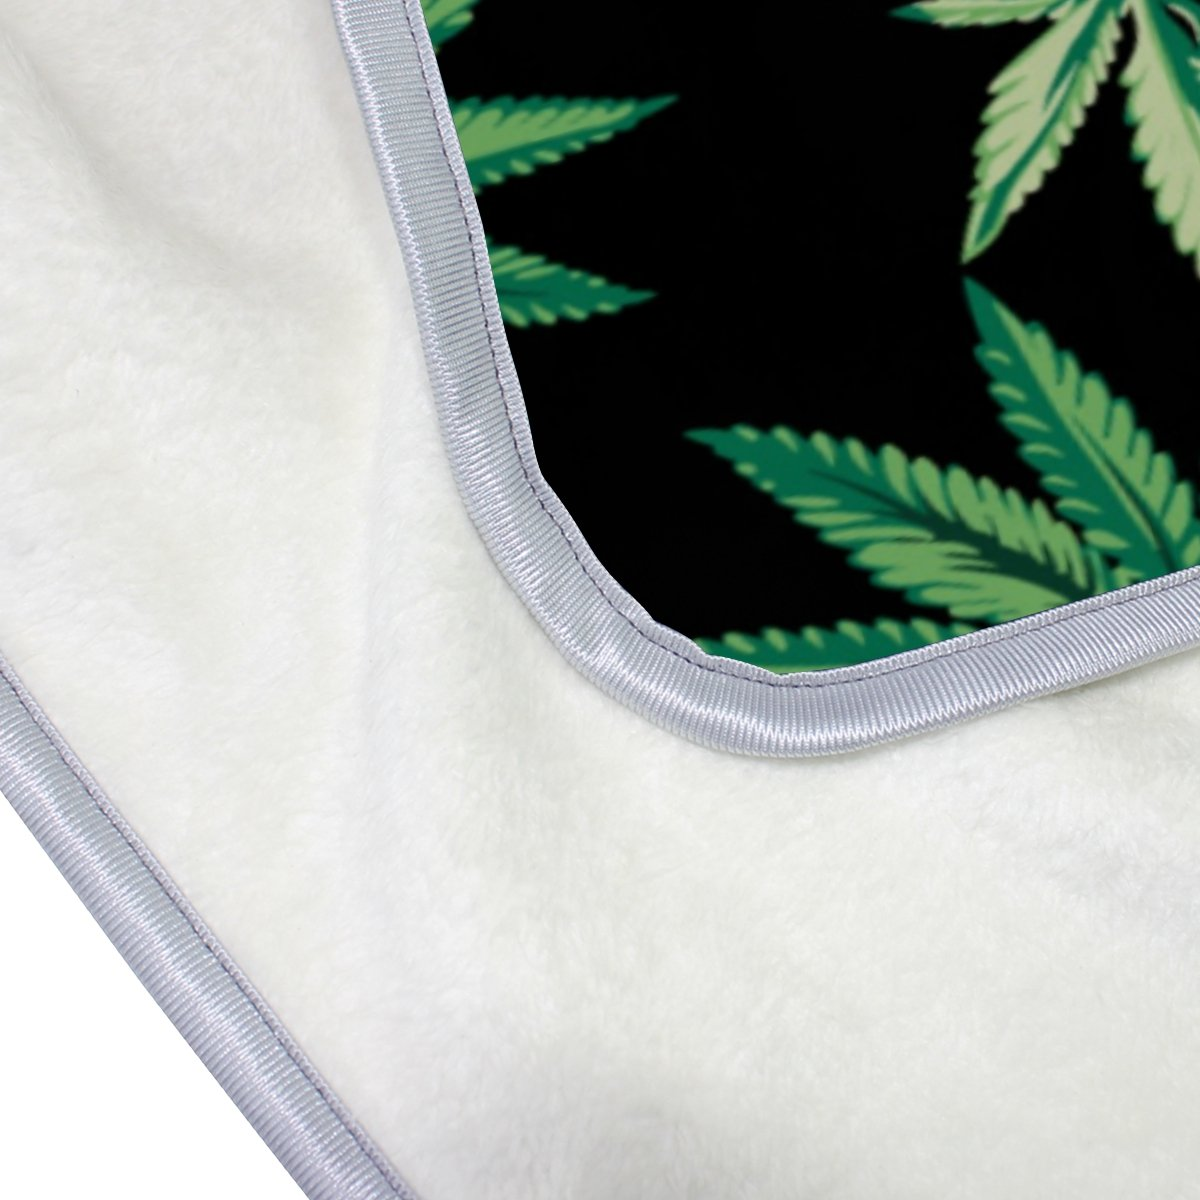 Hoja de Marihuana Cannabis de poliéster de manta de microfibra 50